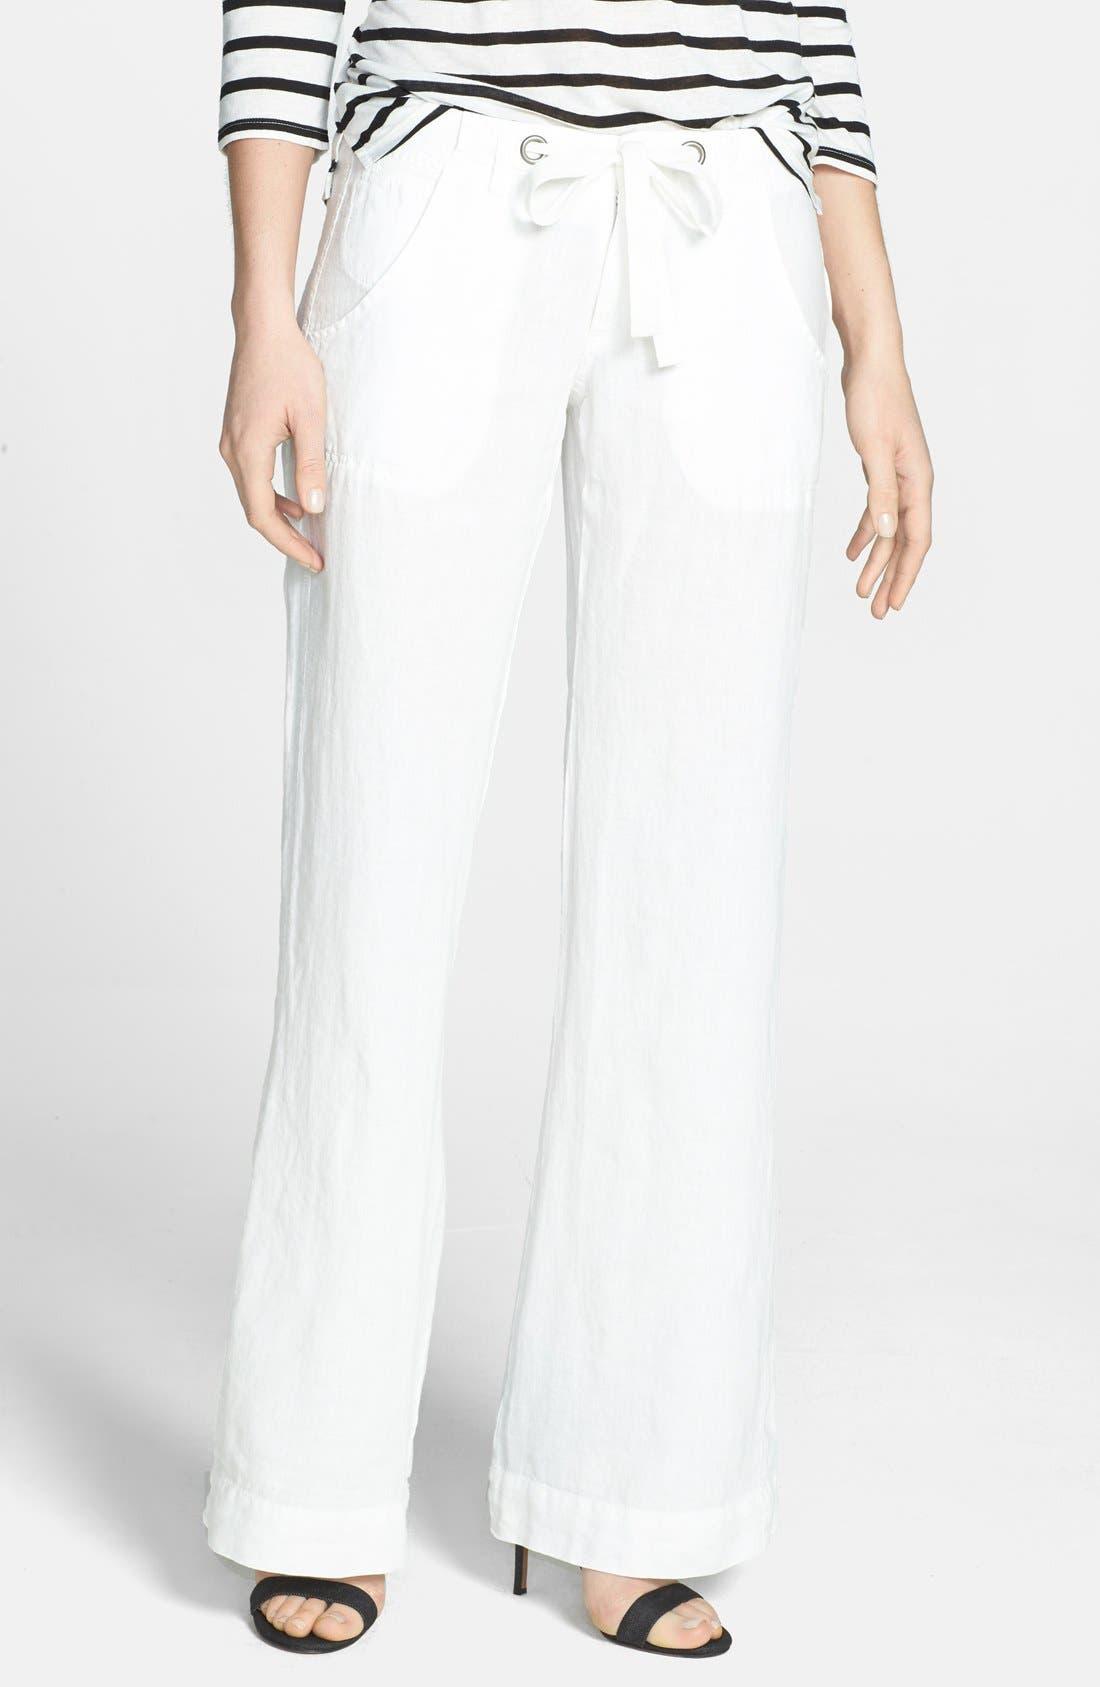 Alternate Image 1 Selected - Joie 'Irreplaceable B.' Linen Pants